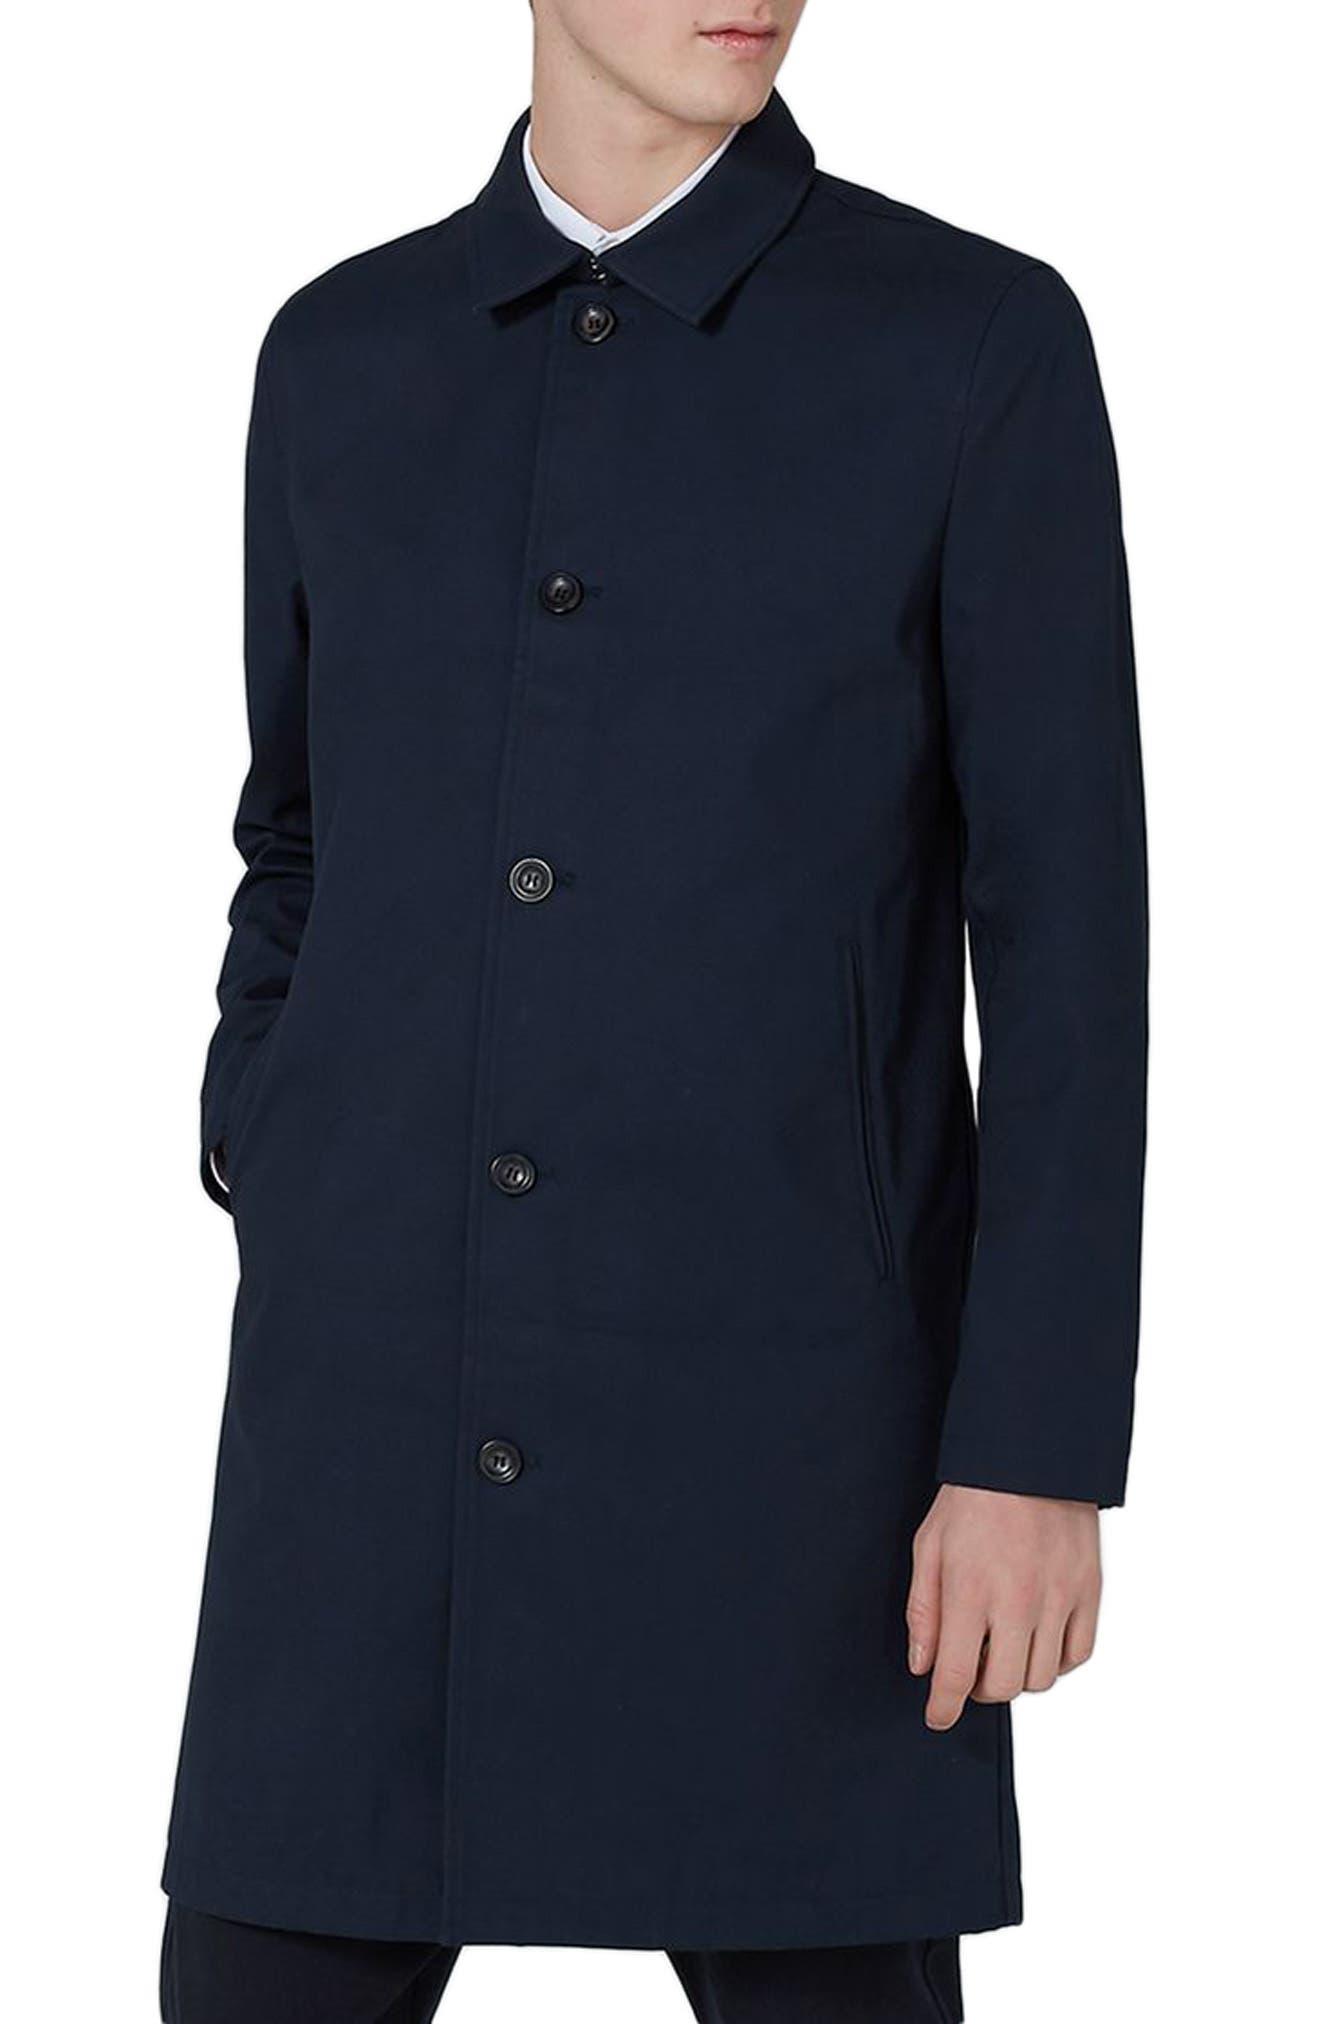 Single Breasted Topcoat,                             Main thumbnail 1, color,                             DARK BLUE